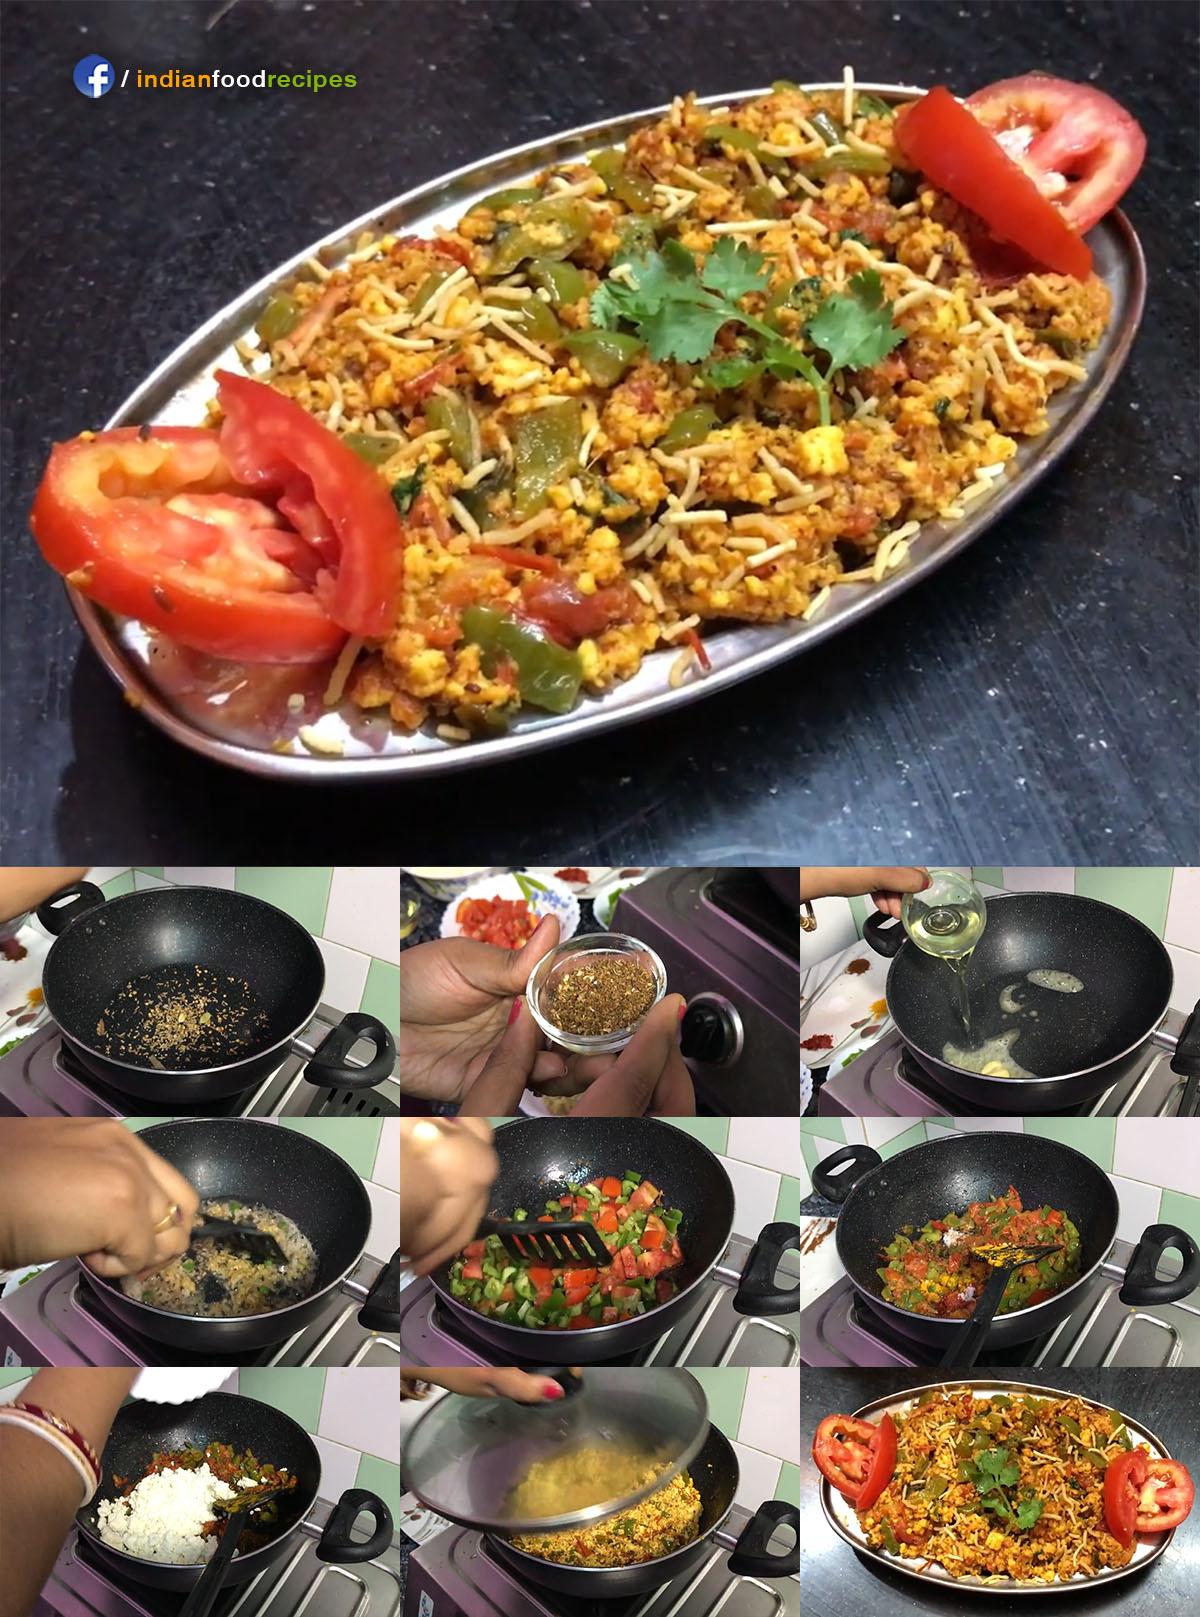 Paneer Bhurji / Scrambled Cottage Cheese recipe step by step